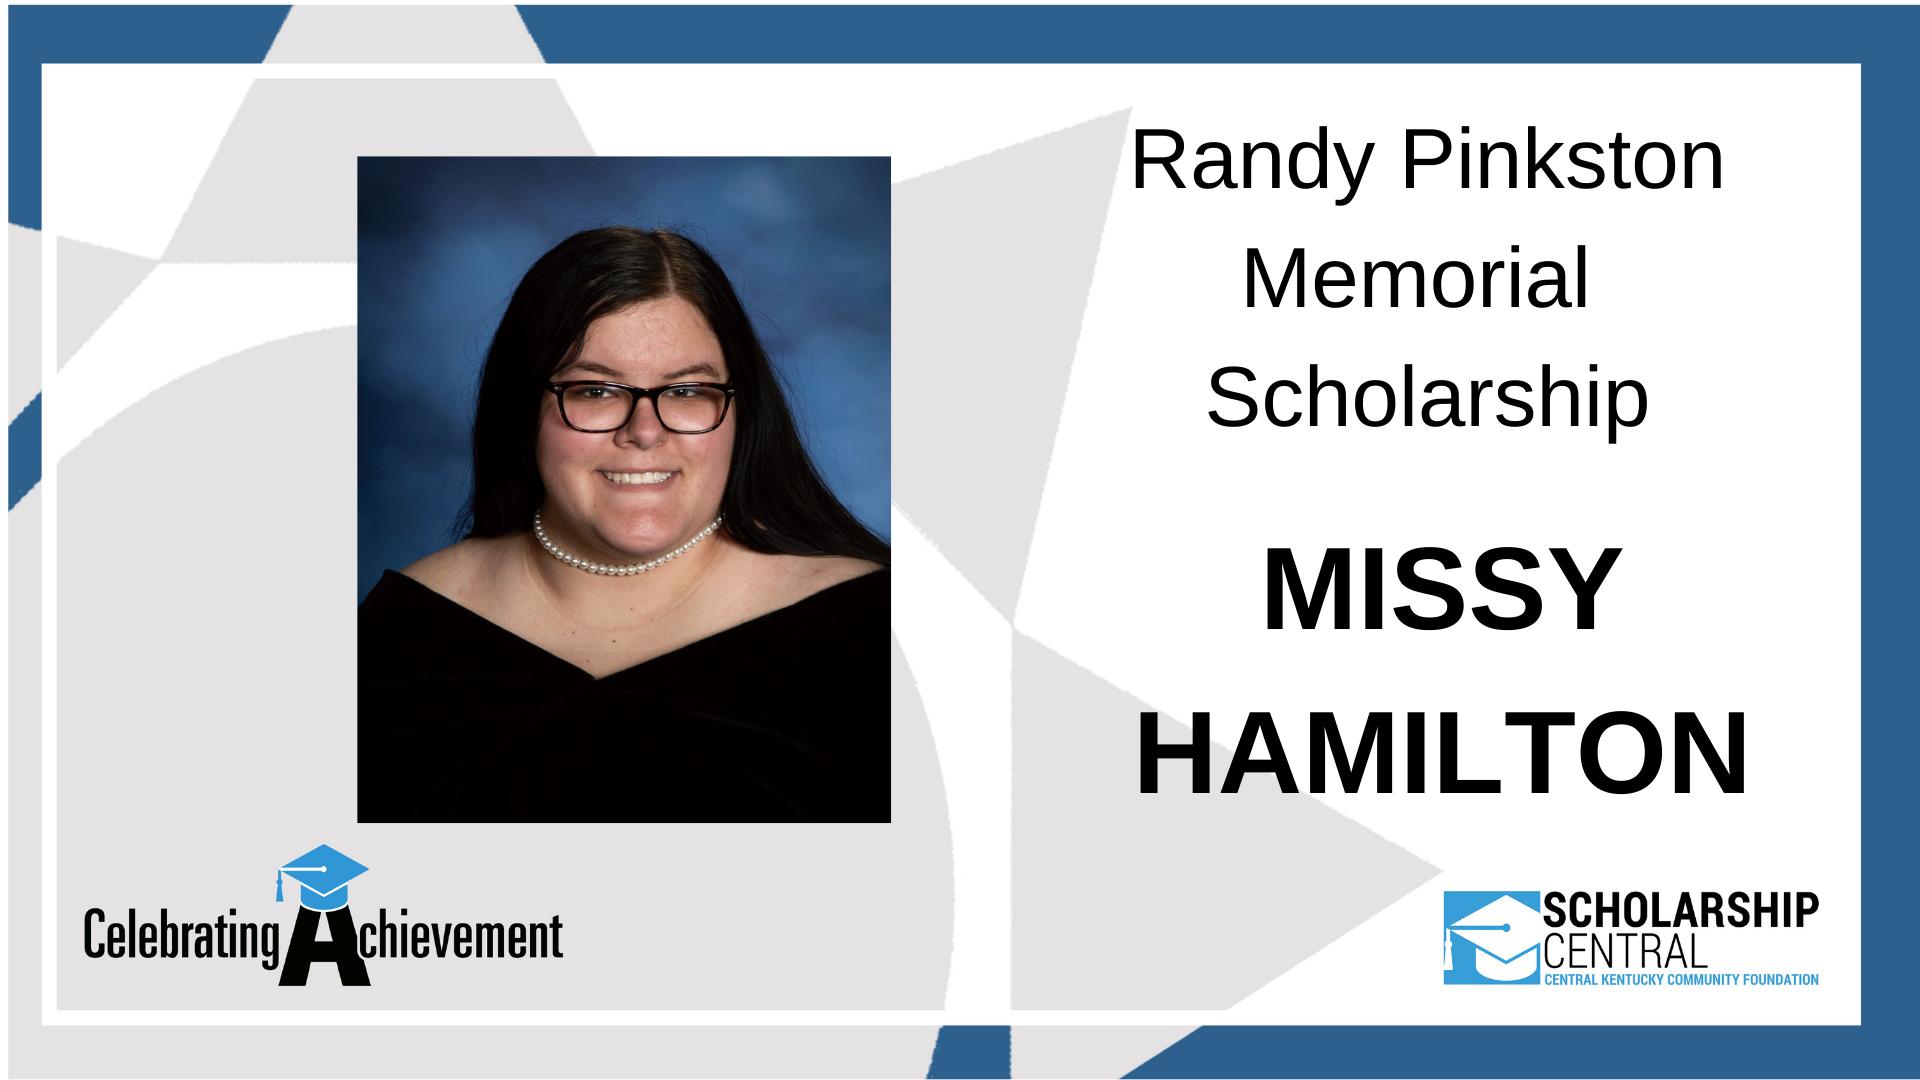 Randy Pinkston Memorial Scholarship Winner